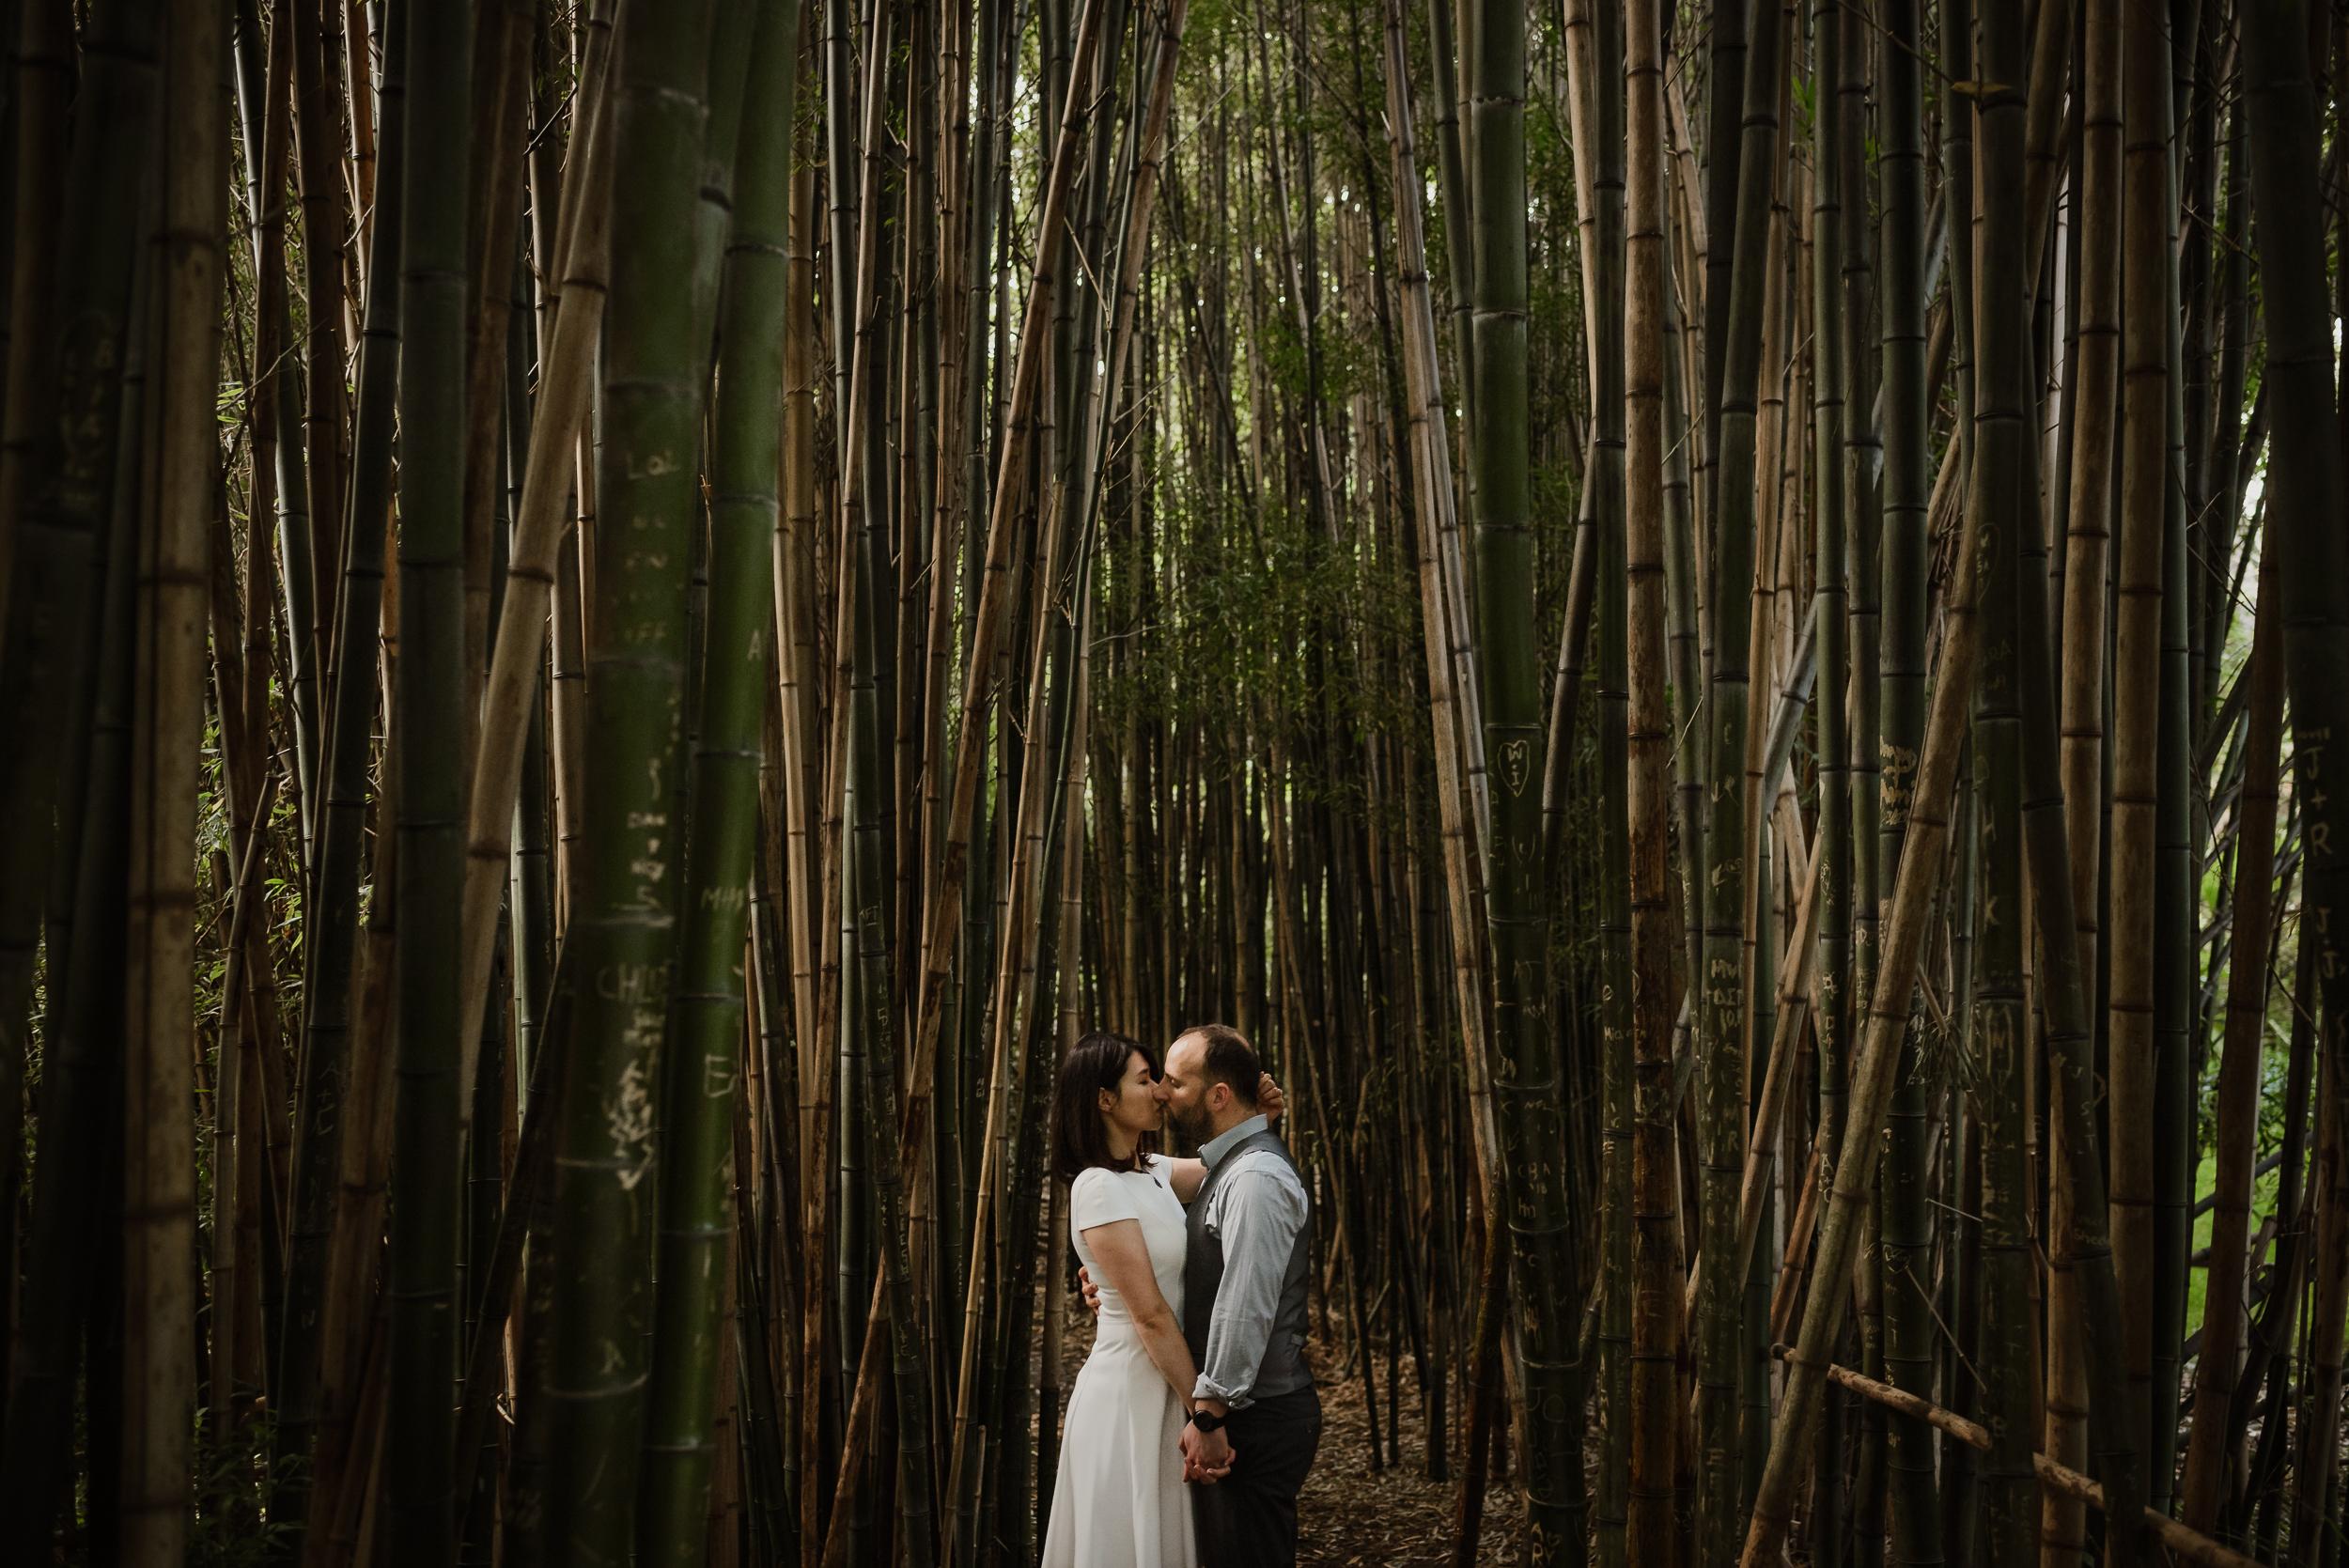 bamboo-pond-san-francisco-botanical-garden-engagement-shoot-vivianchen-125.jpg